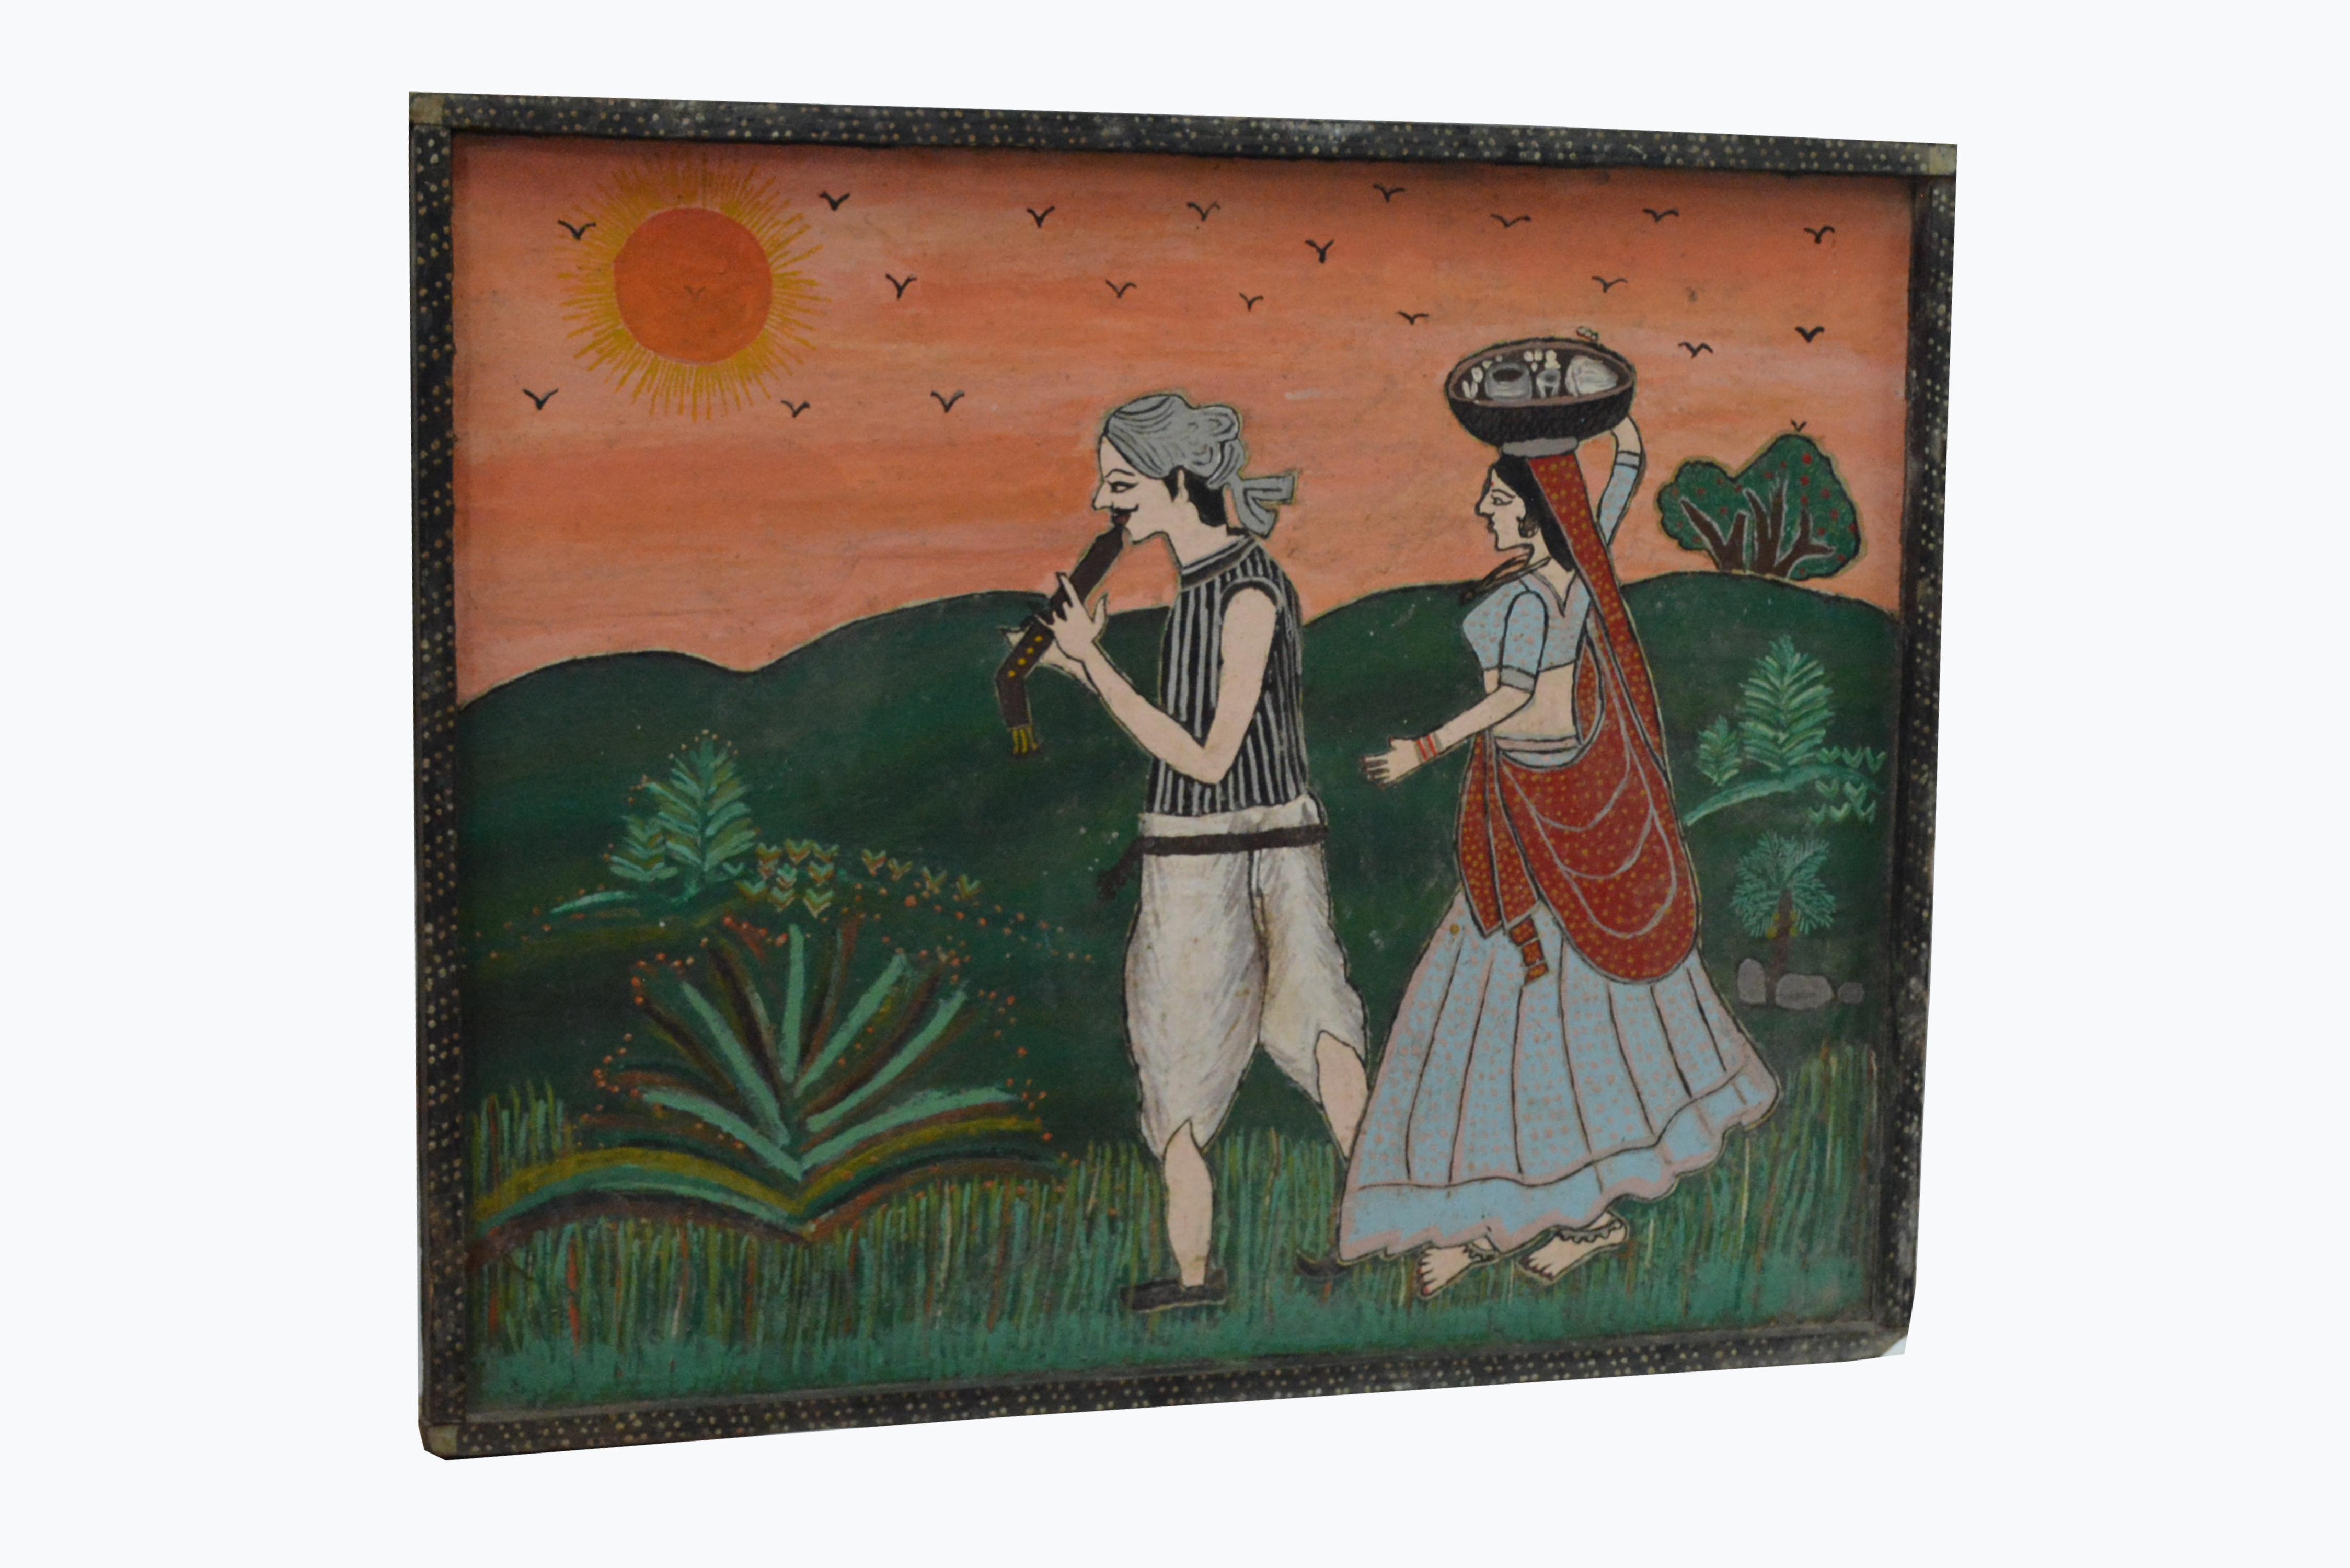 ANRA17140 - 50 x 40 x 2 cm